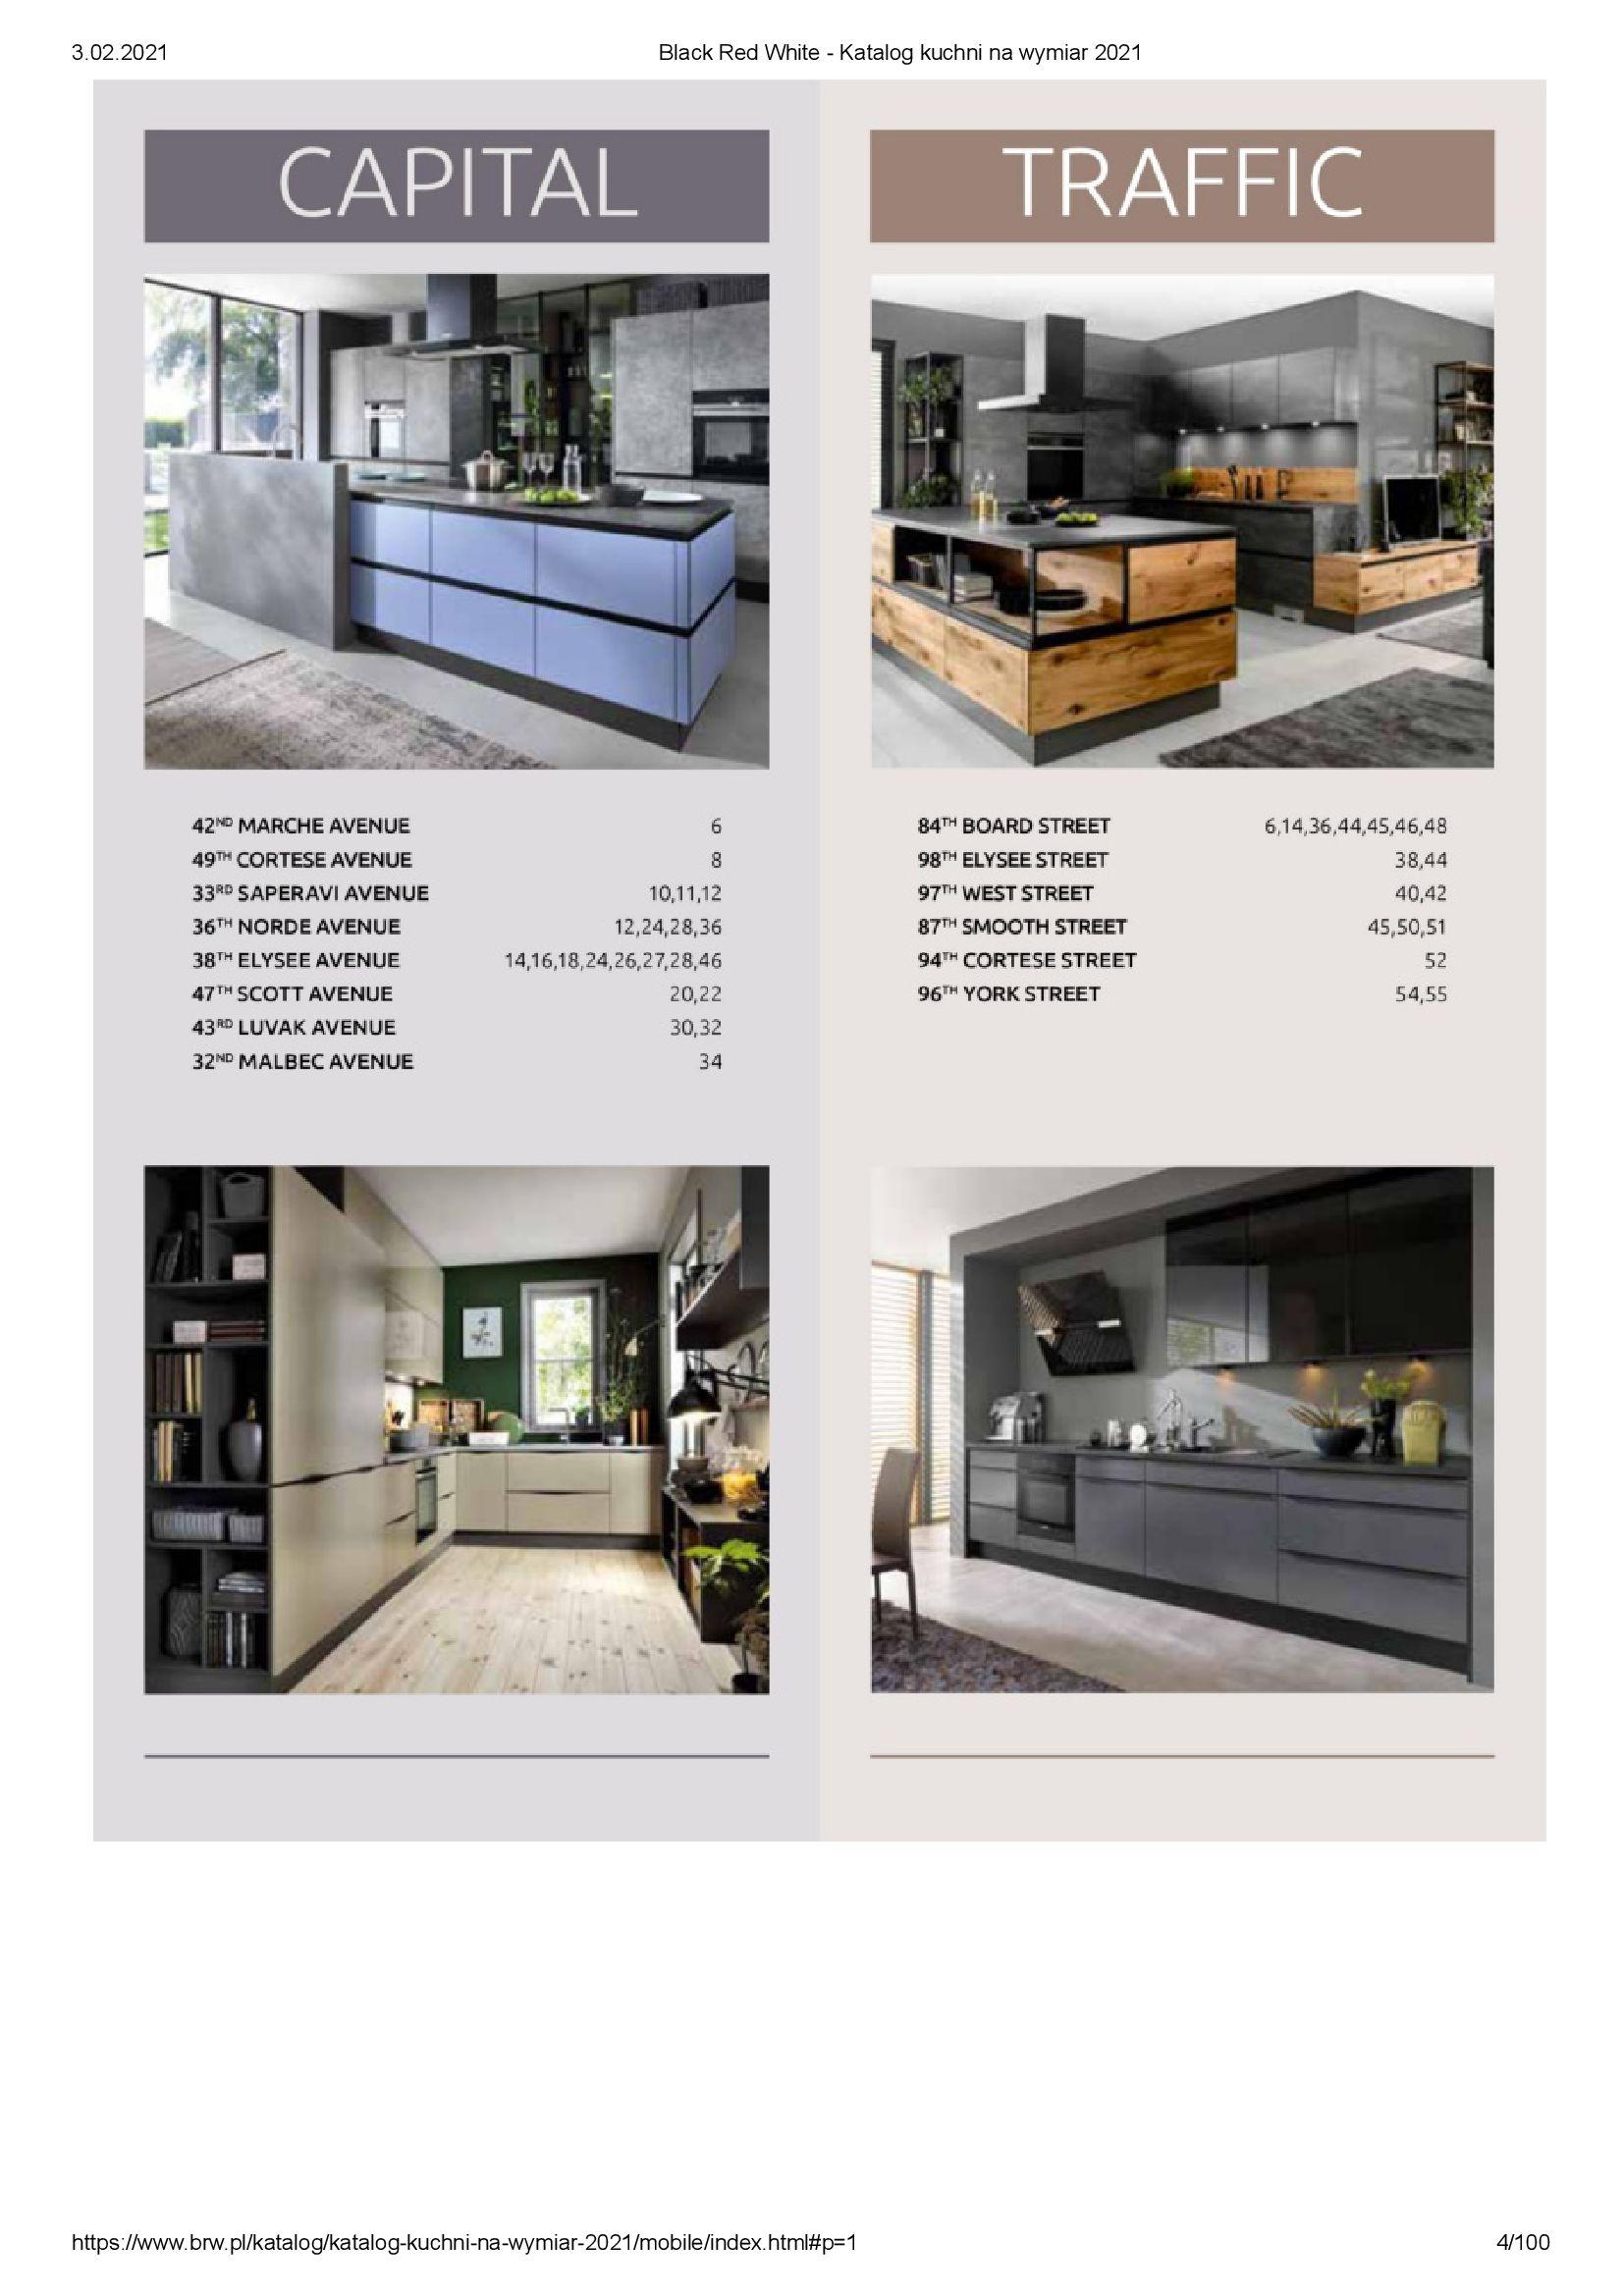 Gazetka Black Red White: Katalog - Kuchnie na wymiar Senso Kitchens 2021 2021-01-01 page-4